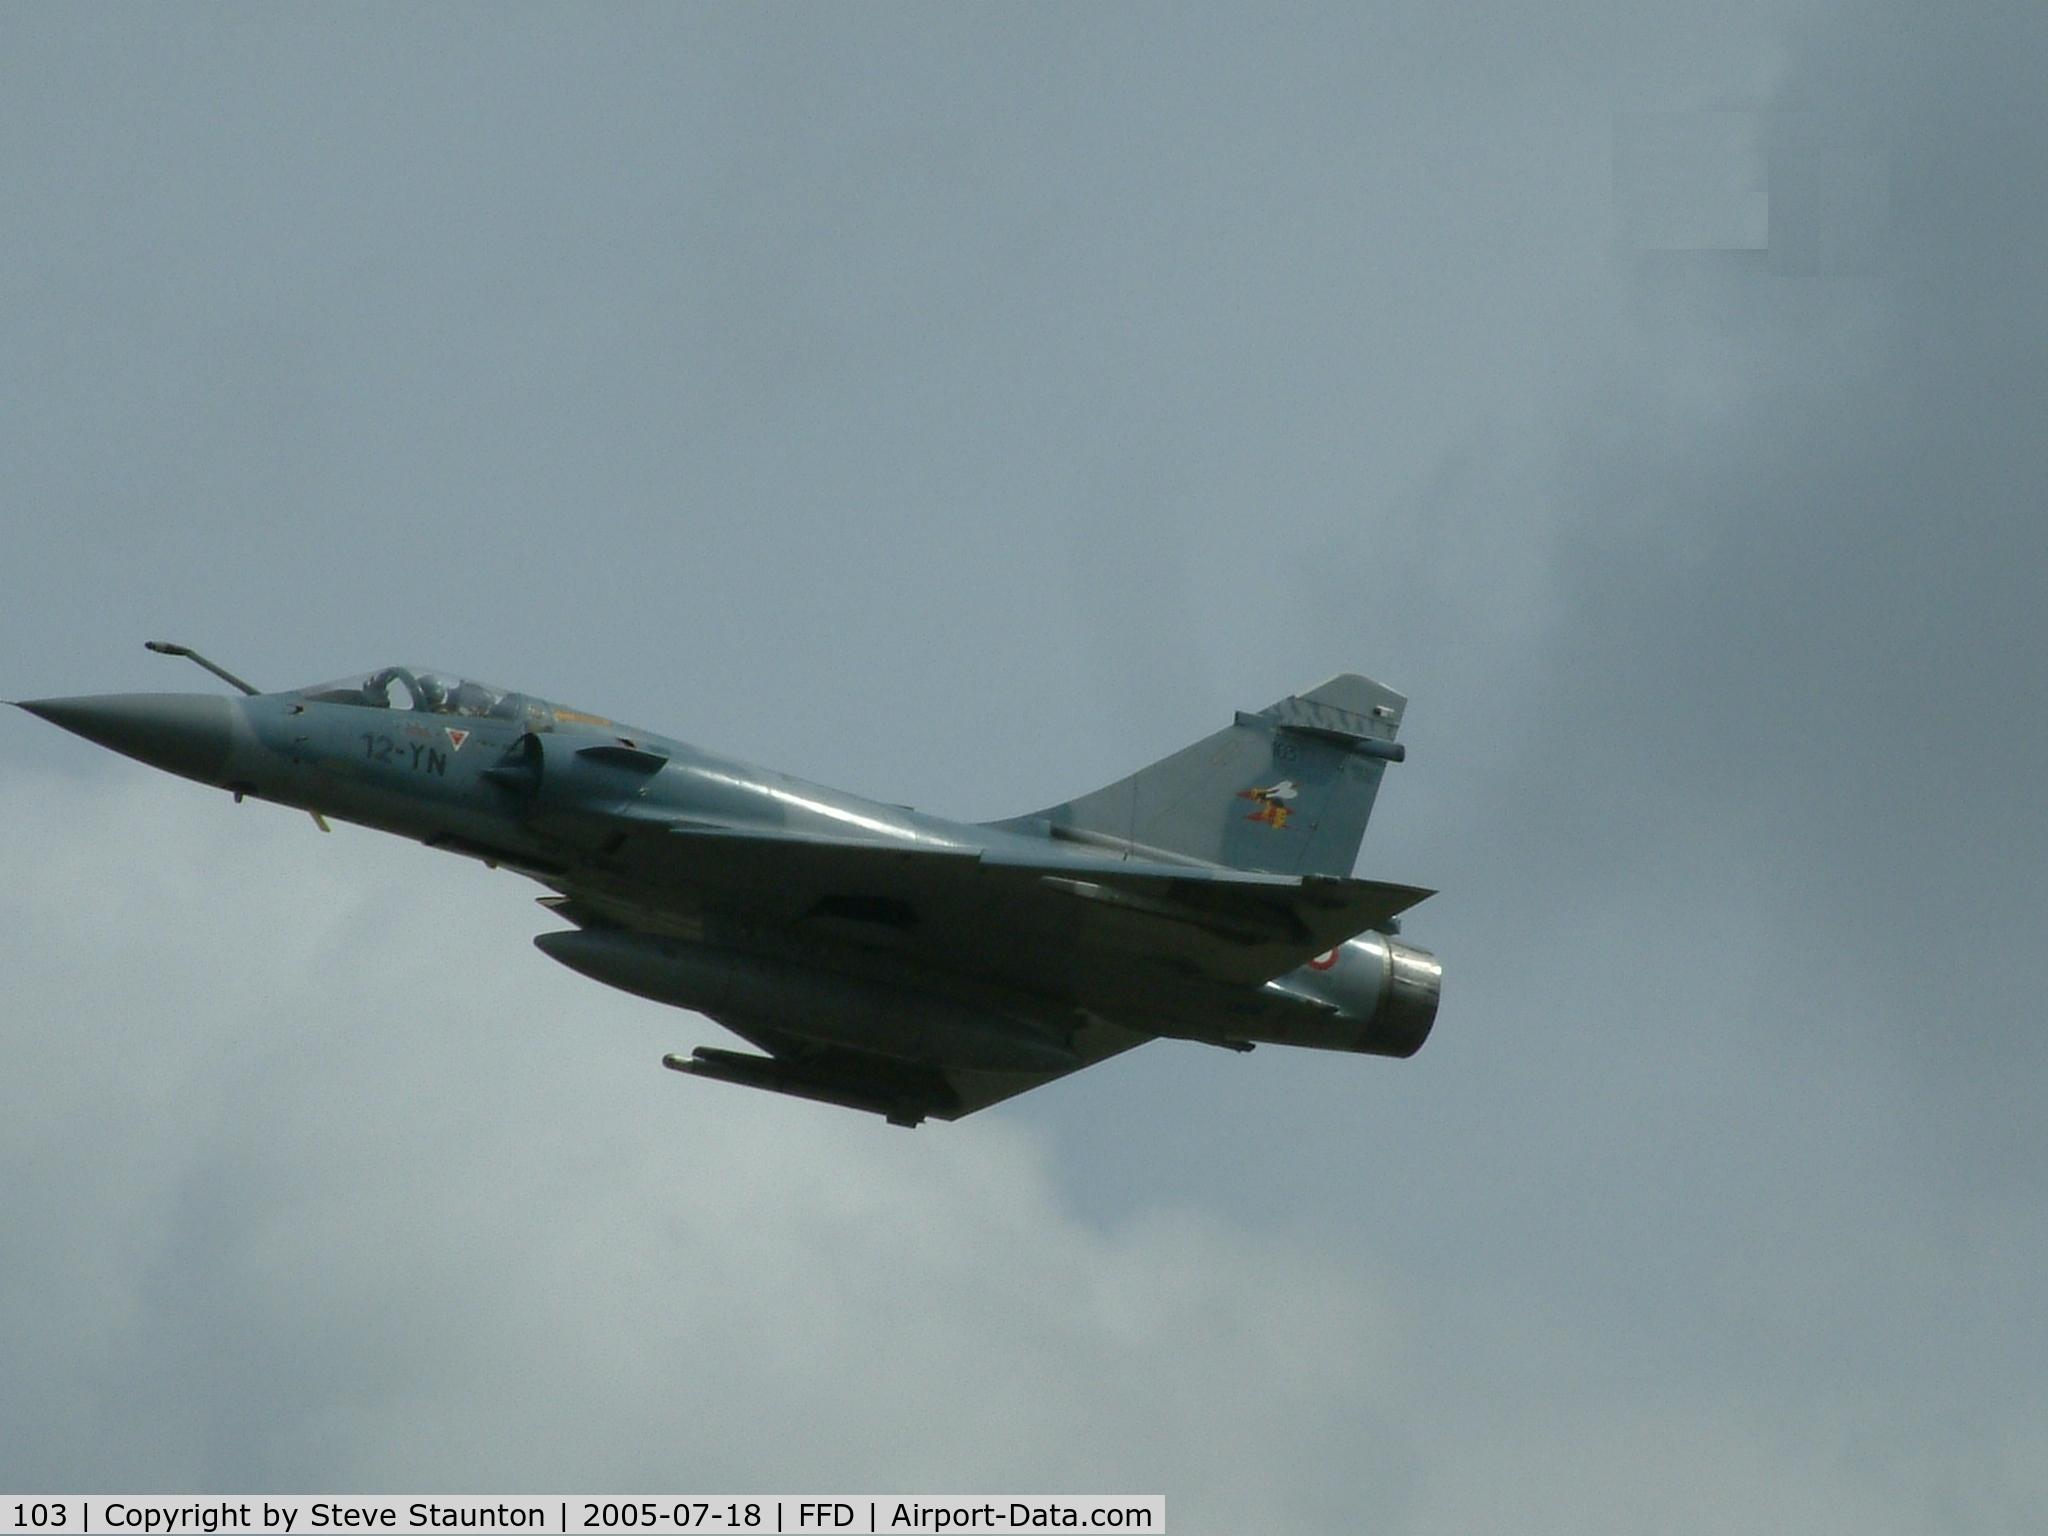 103, Dassault Mirage 2000C C/N 367, Royal International Air Tattoo 2005